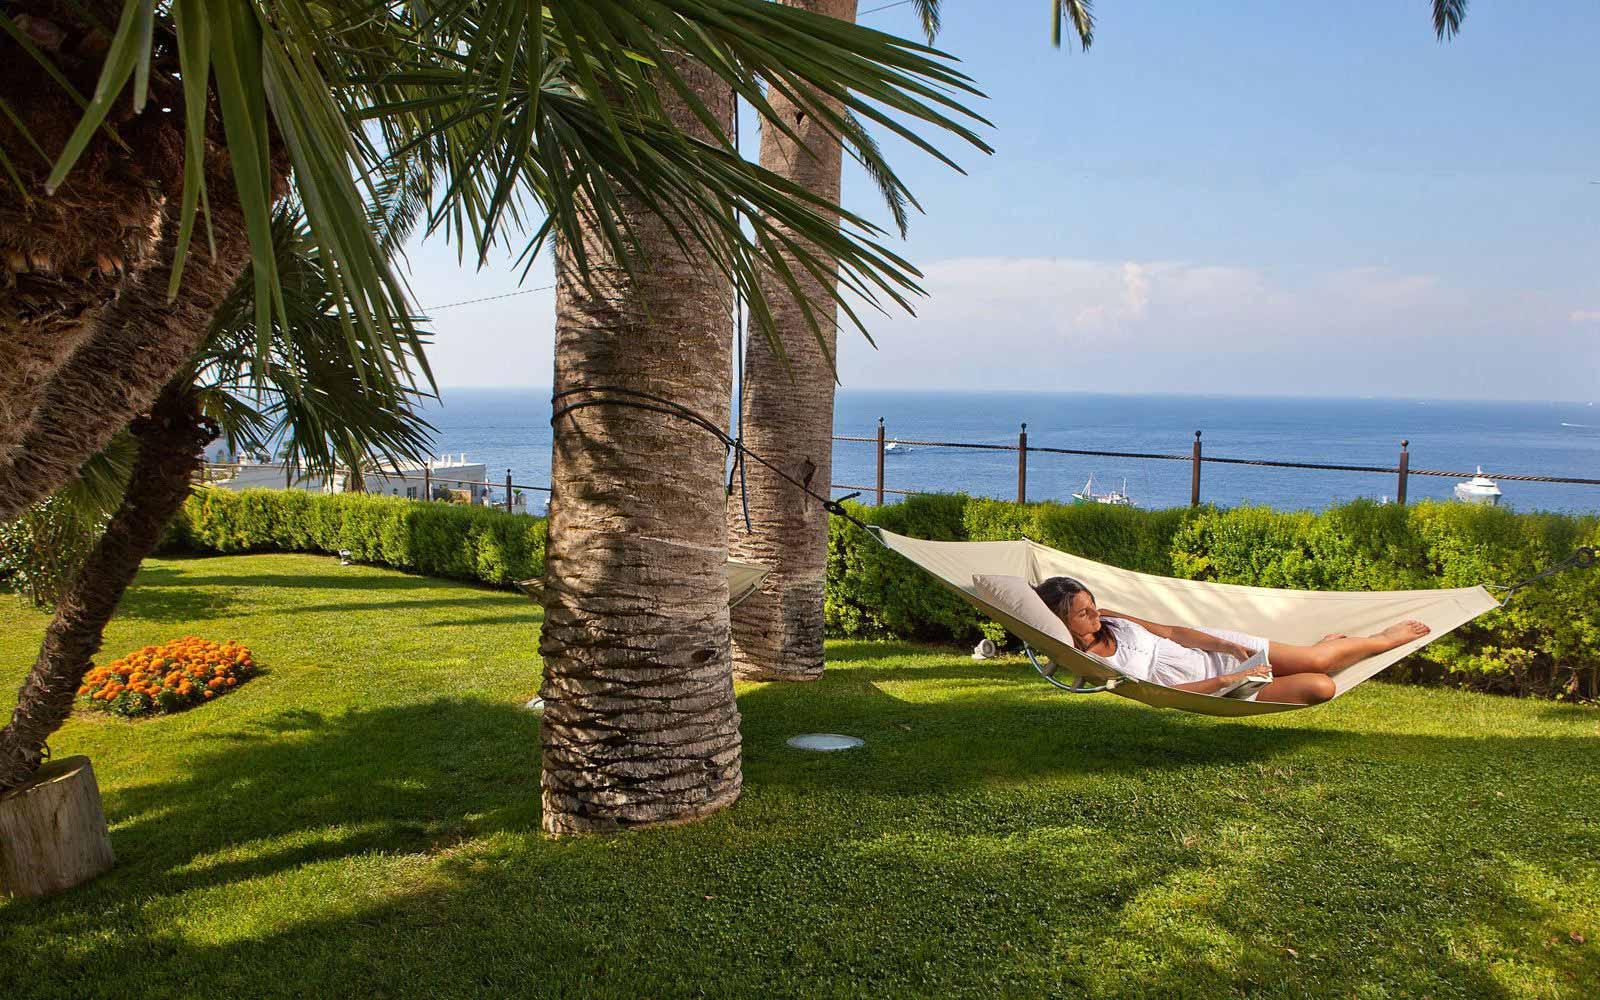 Relaxing in the shade at Villa Marini Capri Hotel & Spa